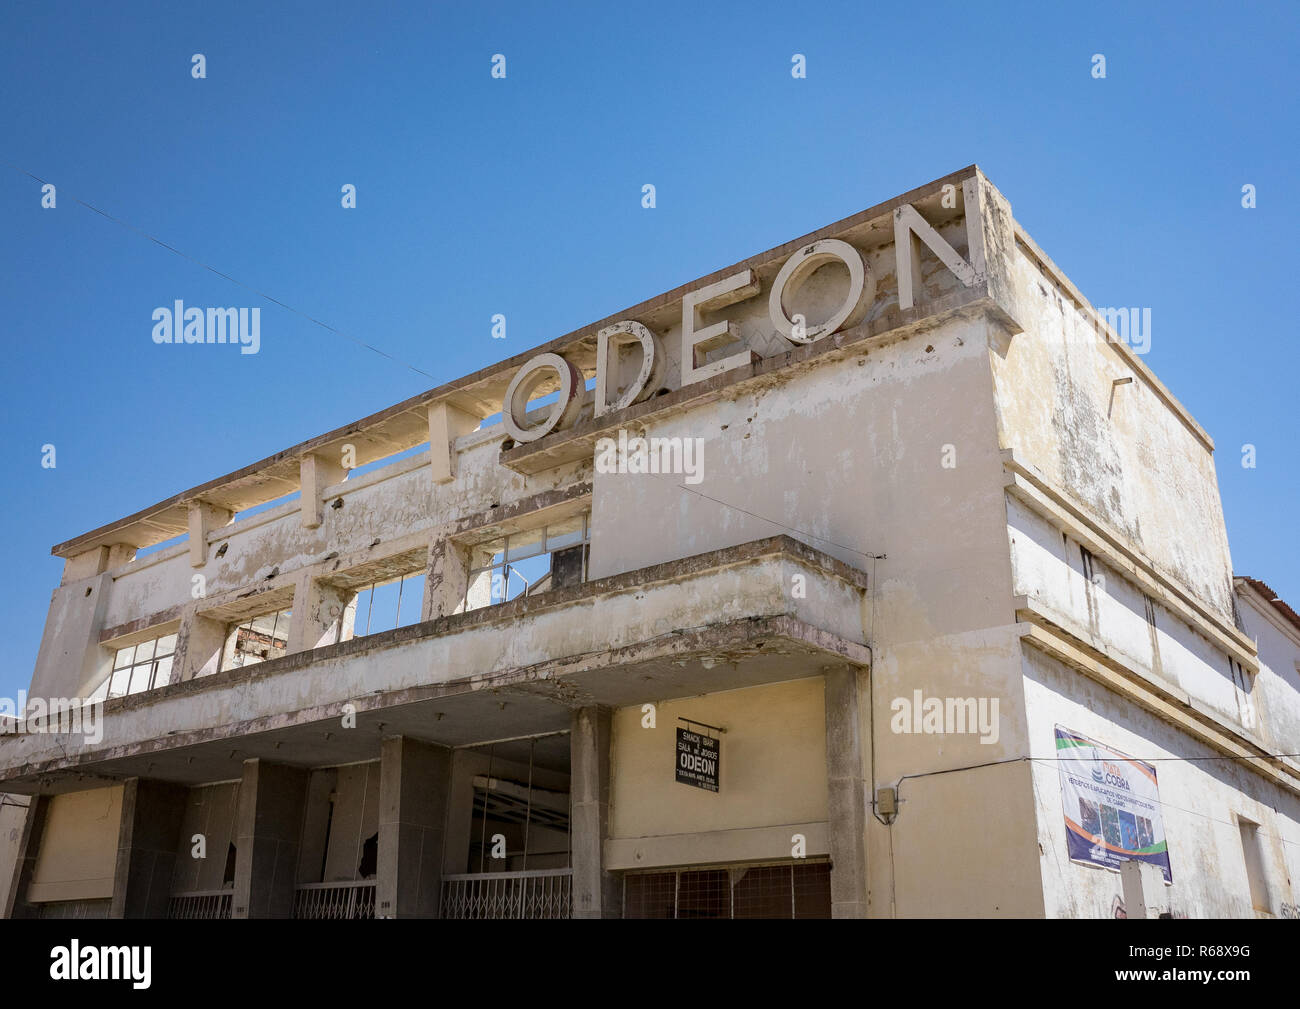 Cine Teatro Odeon, an old portuguese colonial building, Huila Province, Lubango, Angola - Stock Image